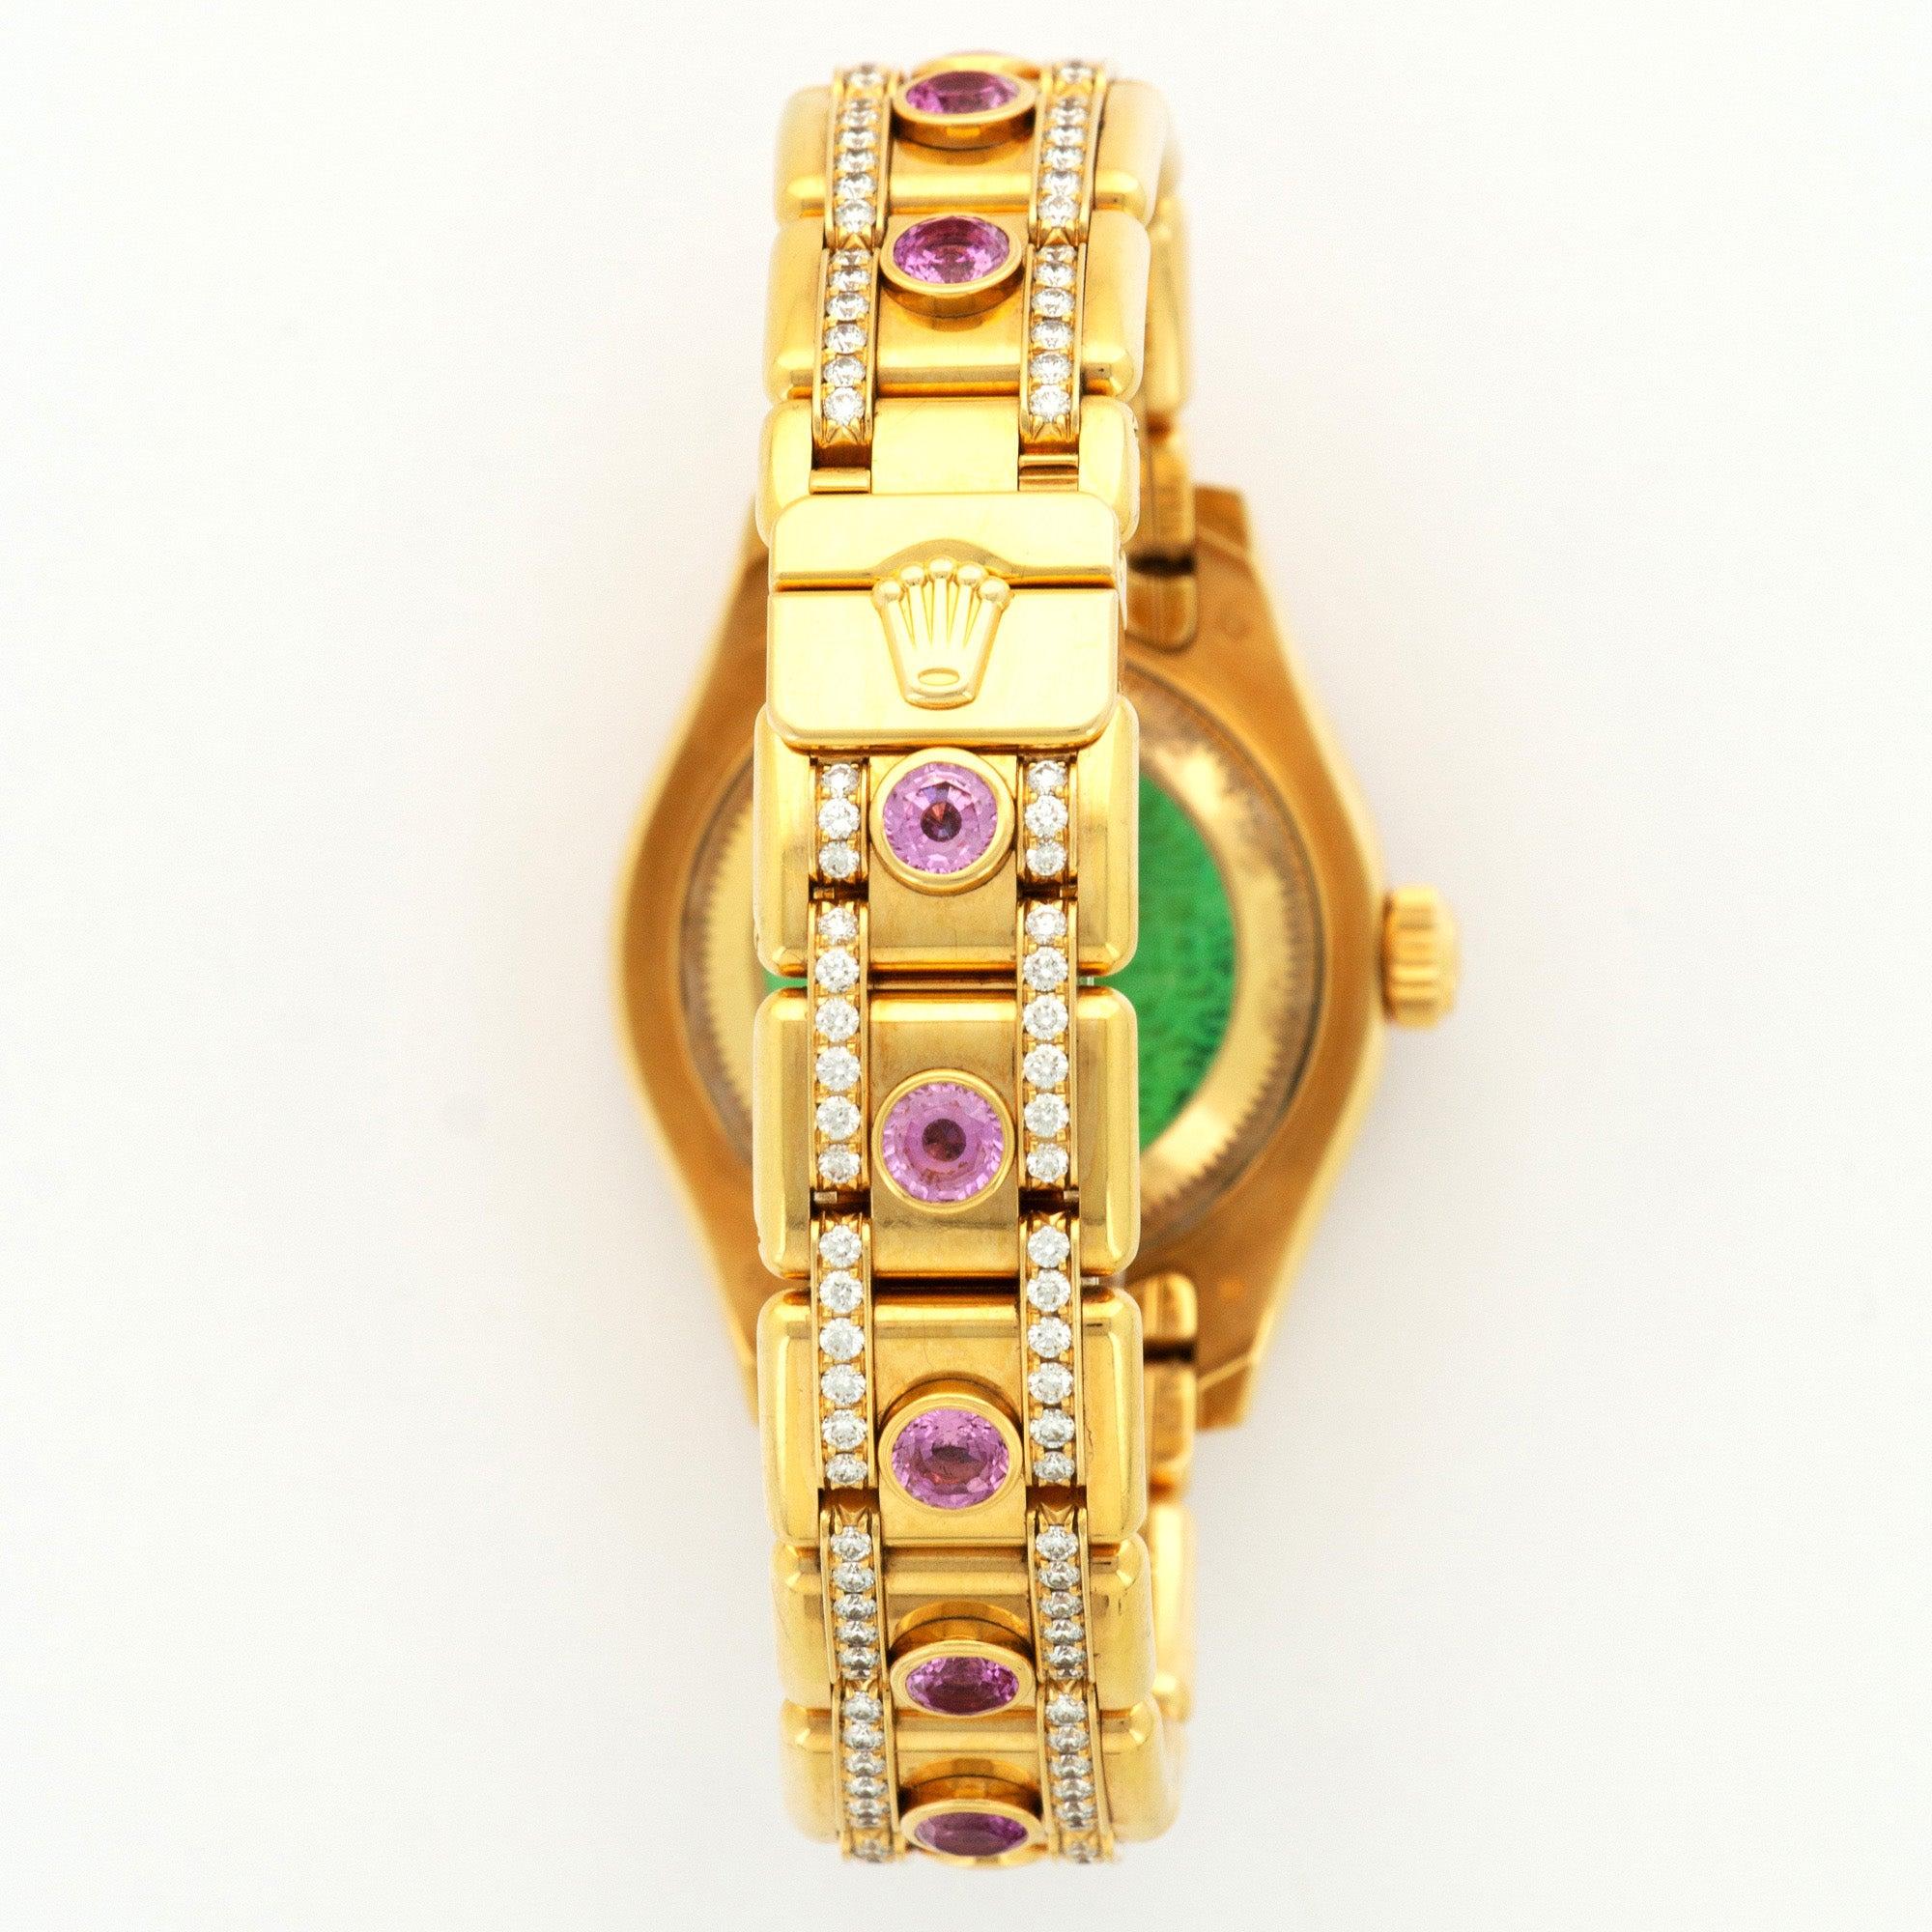 Rolex Yellow Gold Diamond Sapphire Datejust Pearlmaster Automatic